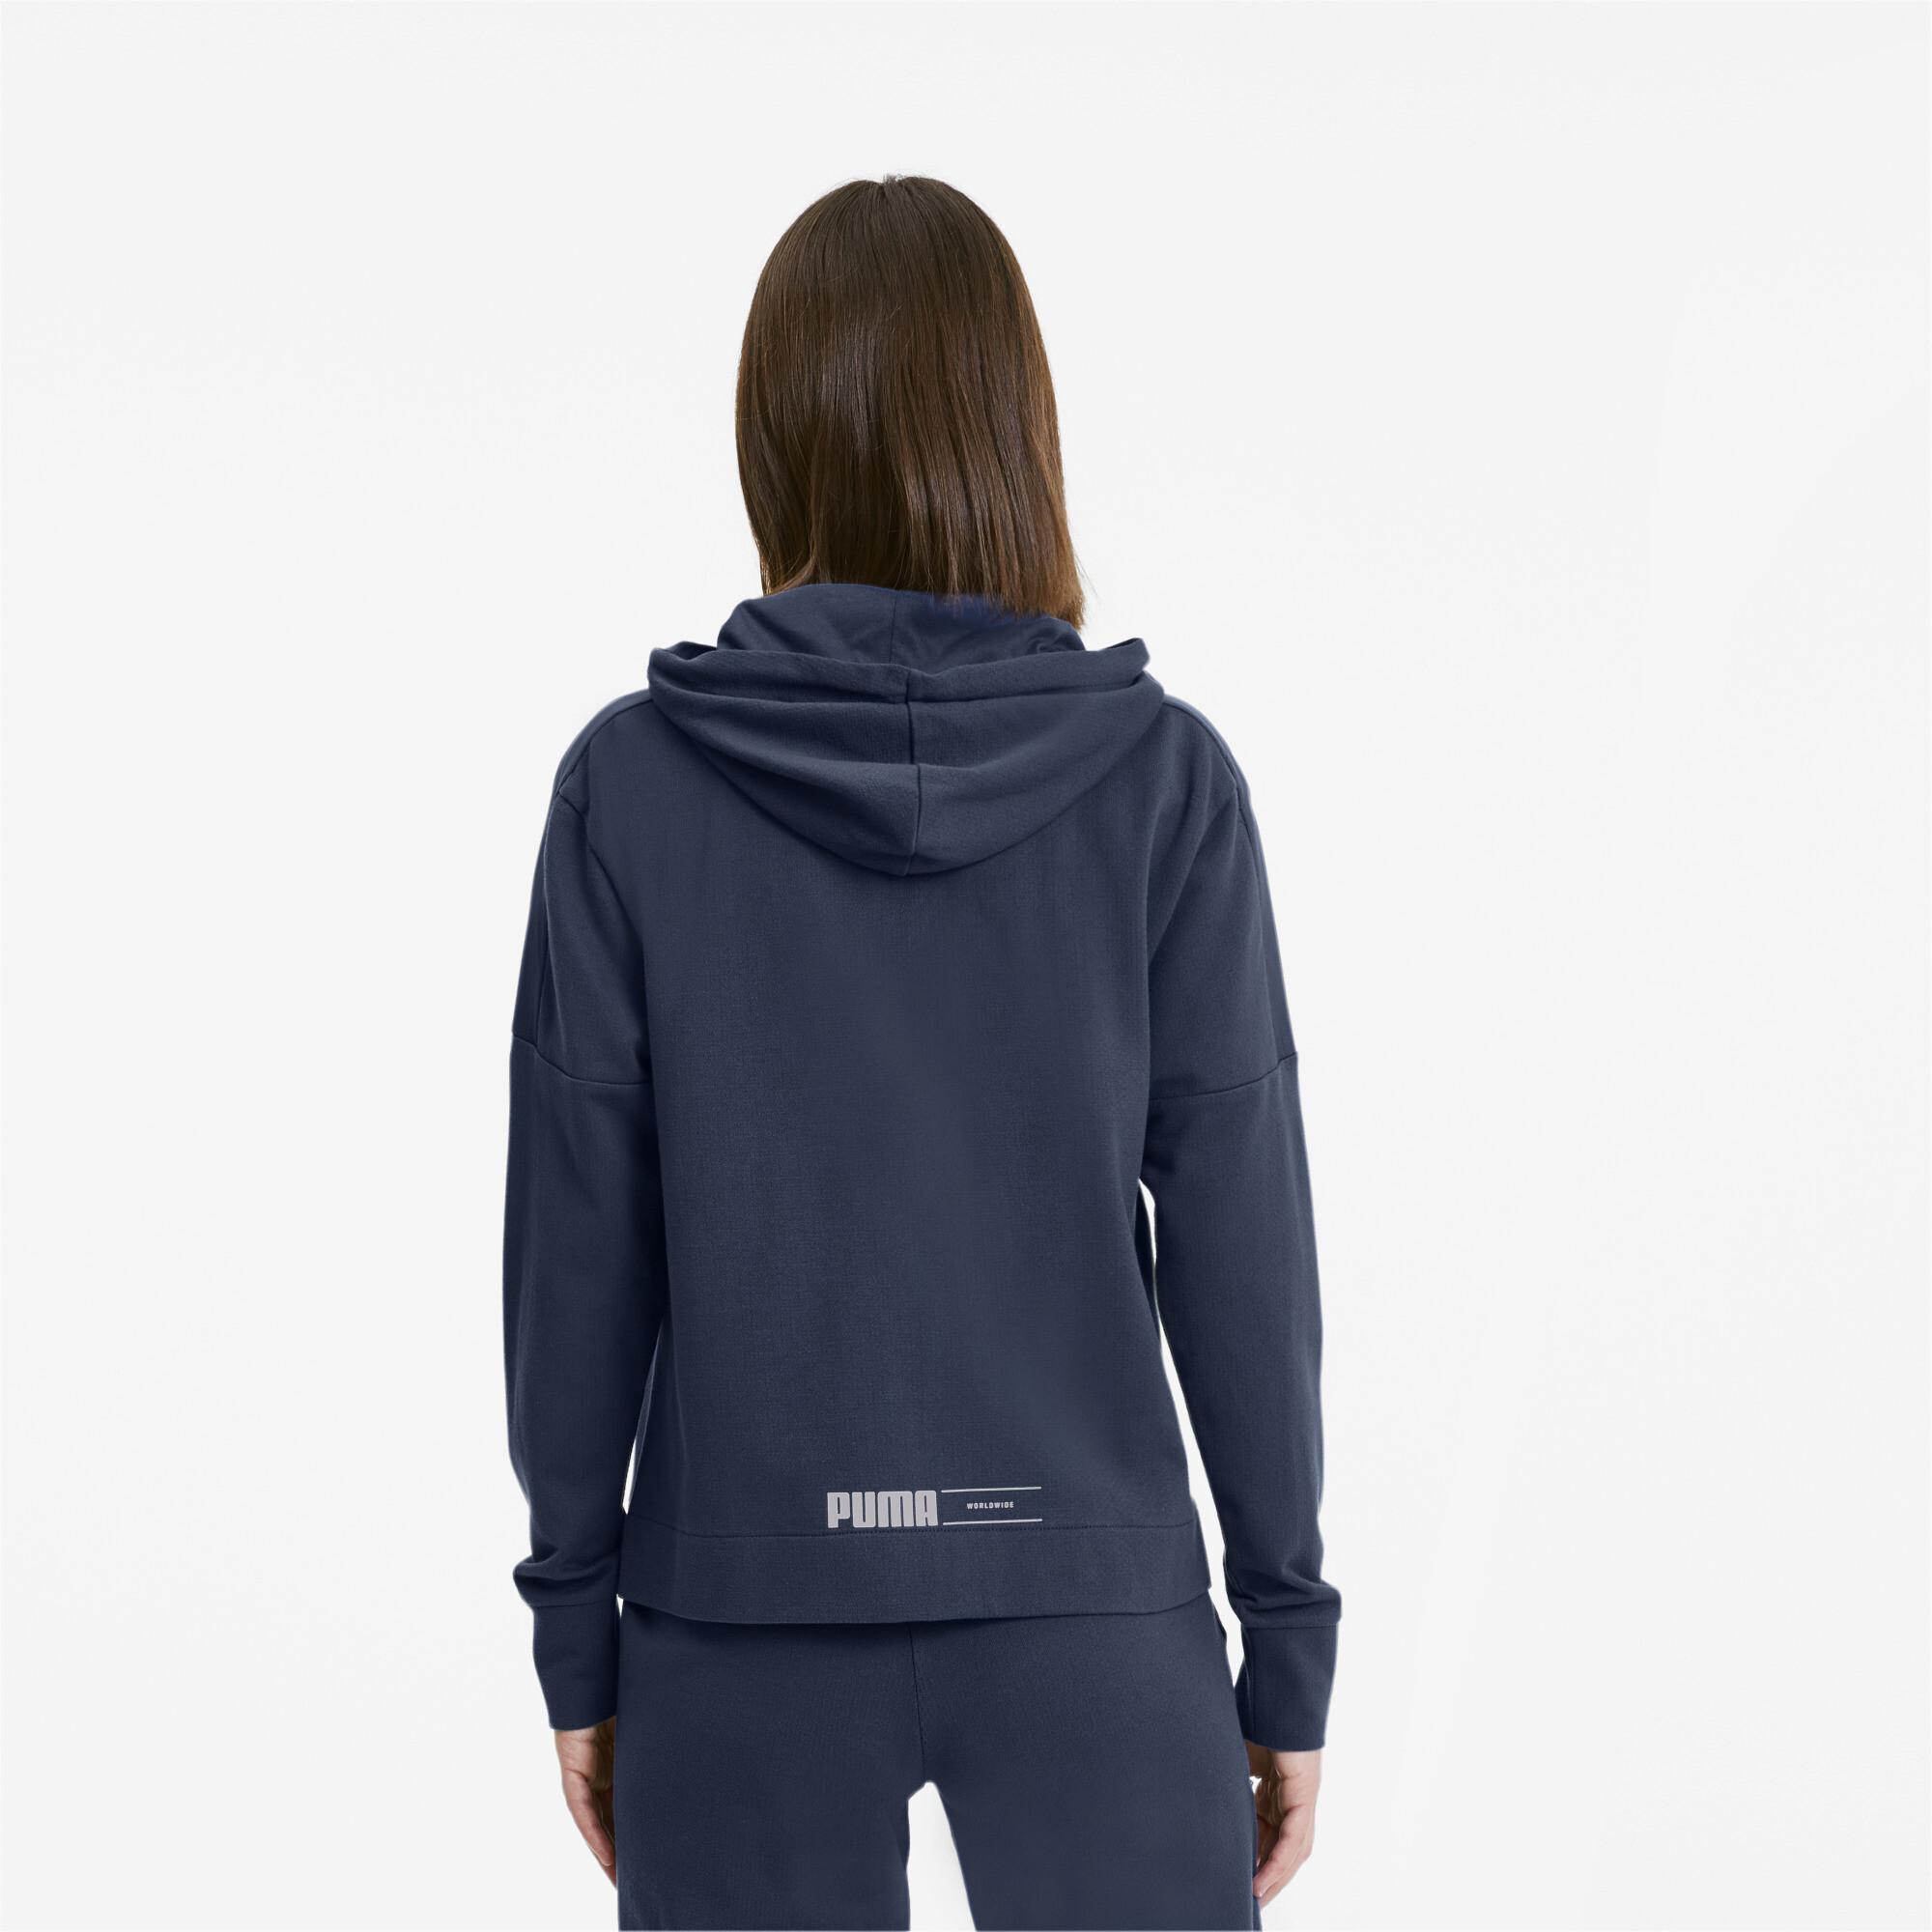 PUMA-NU-TILITY-Women-039-s-Full-Zip-Hoodie-Women-Sweat-Basics miniatuur 5